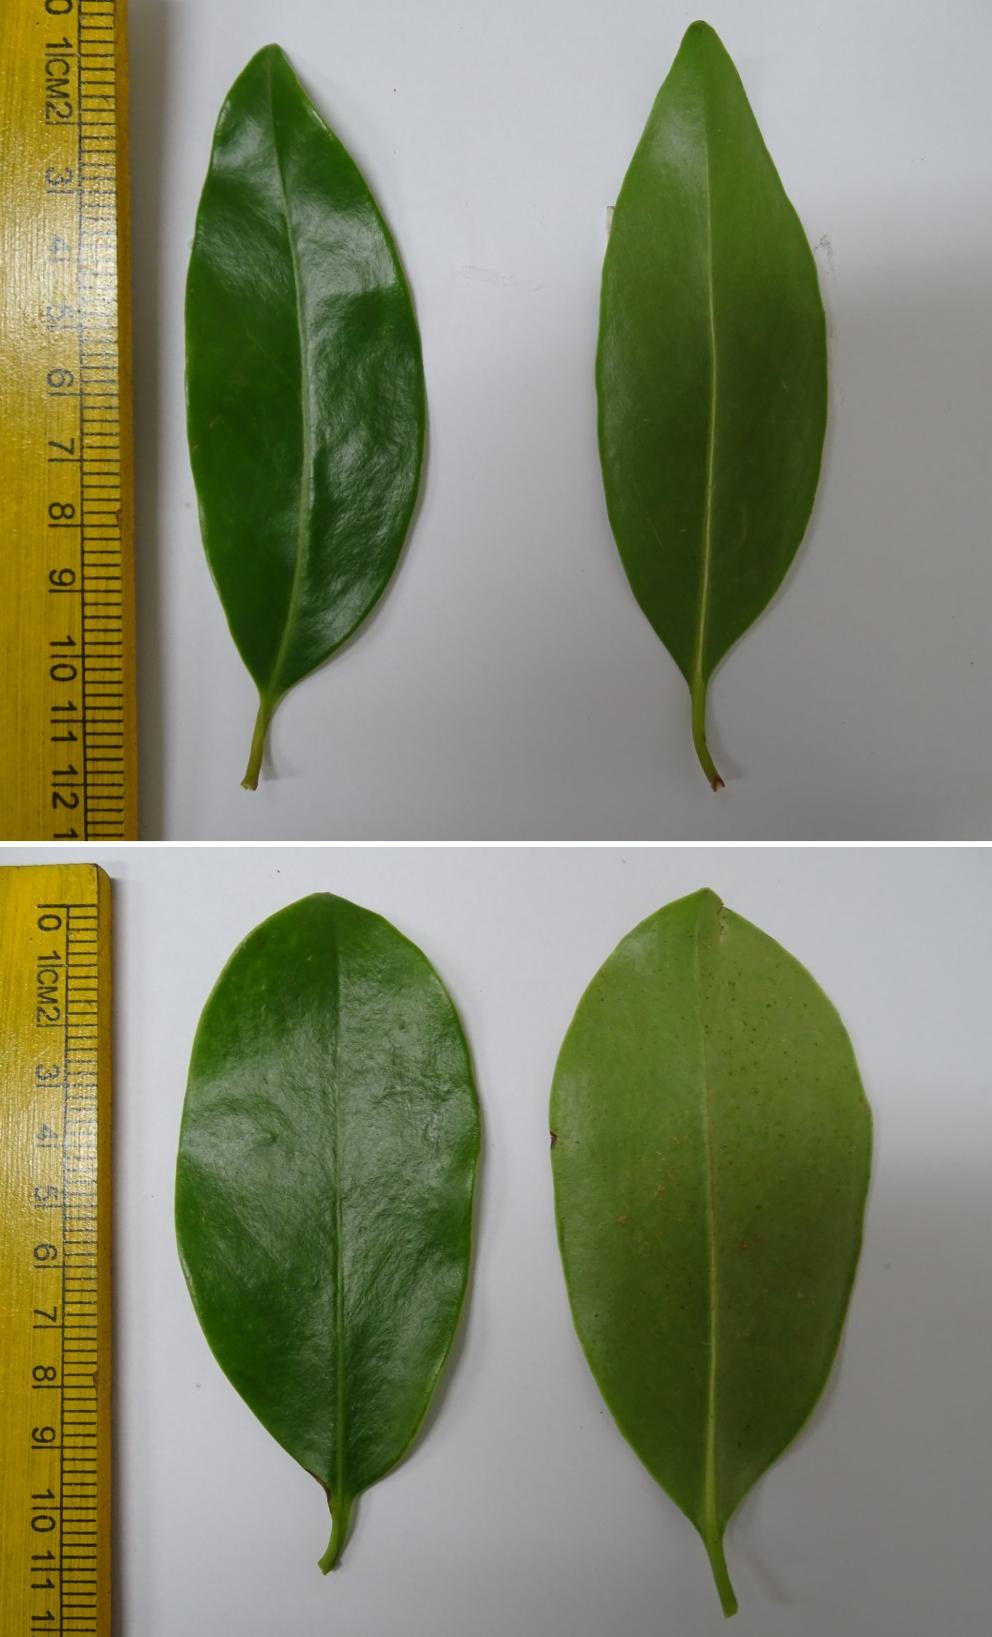 Morphological and Biochemical Studies in Garcinia gummi